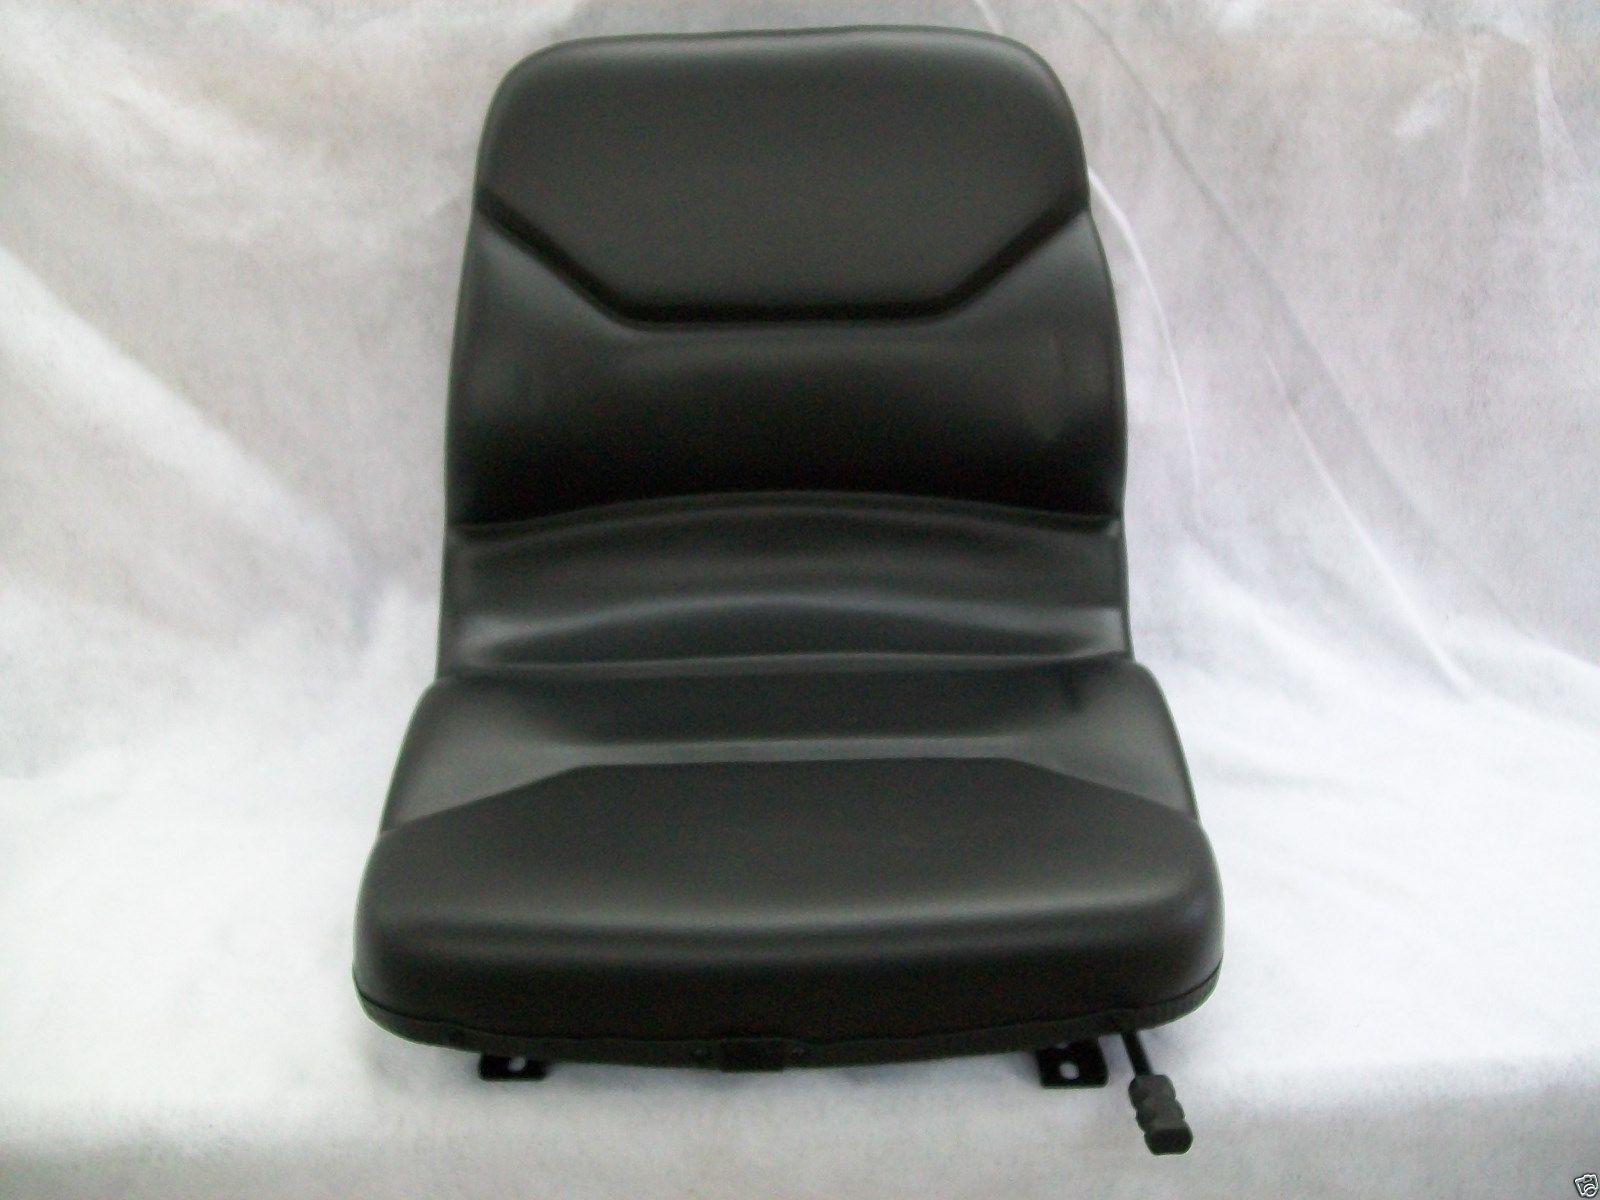 seat warehouse high back black seat bobcat s130 s150 s160 high back black seat bobcat s130s150s160s175s185s205s220skid steer ev